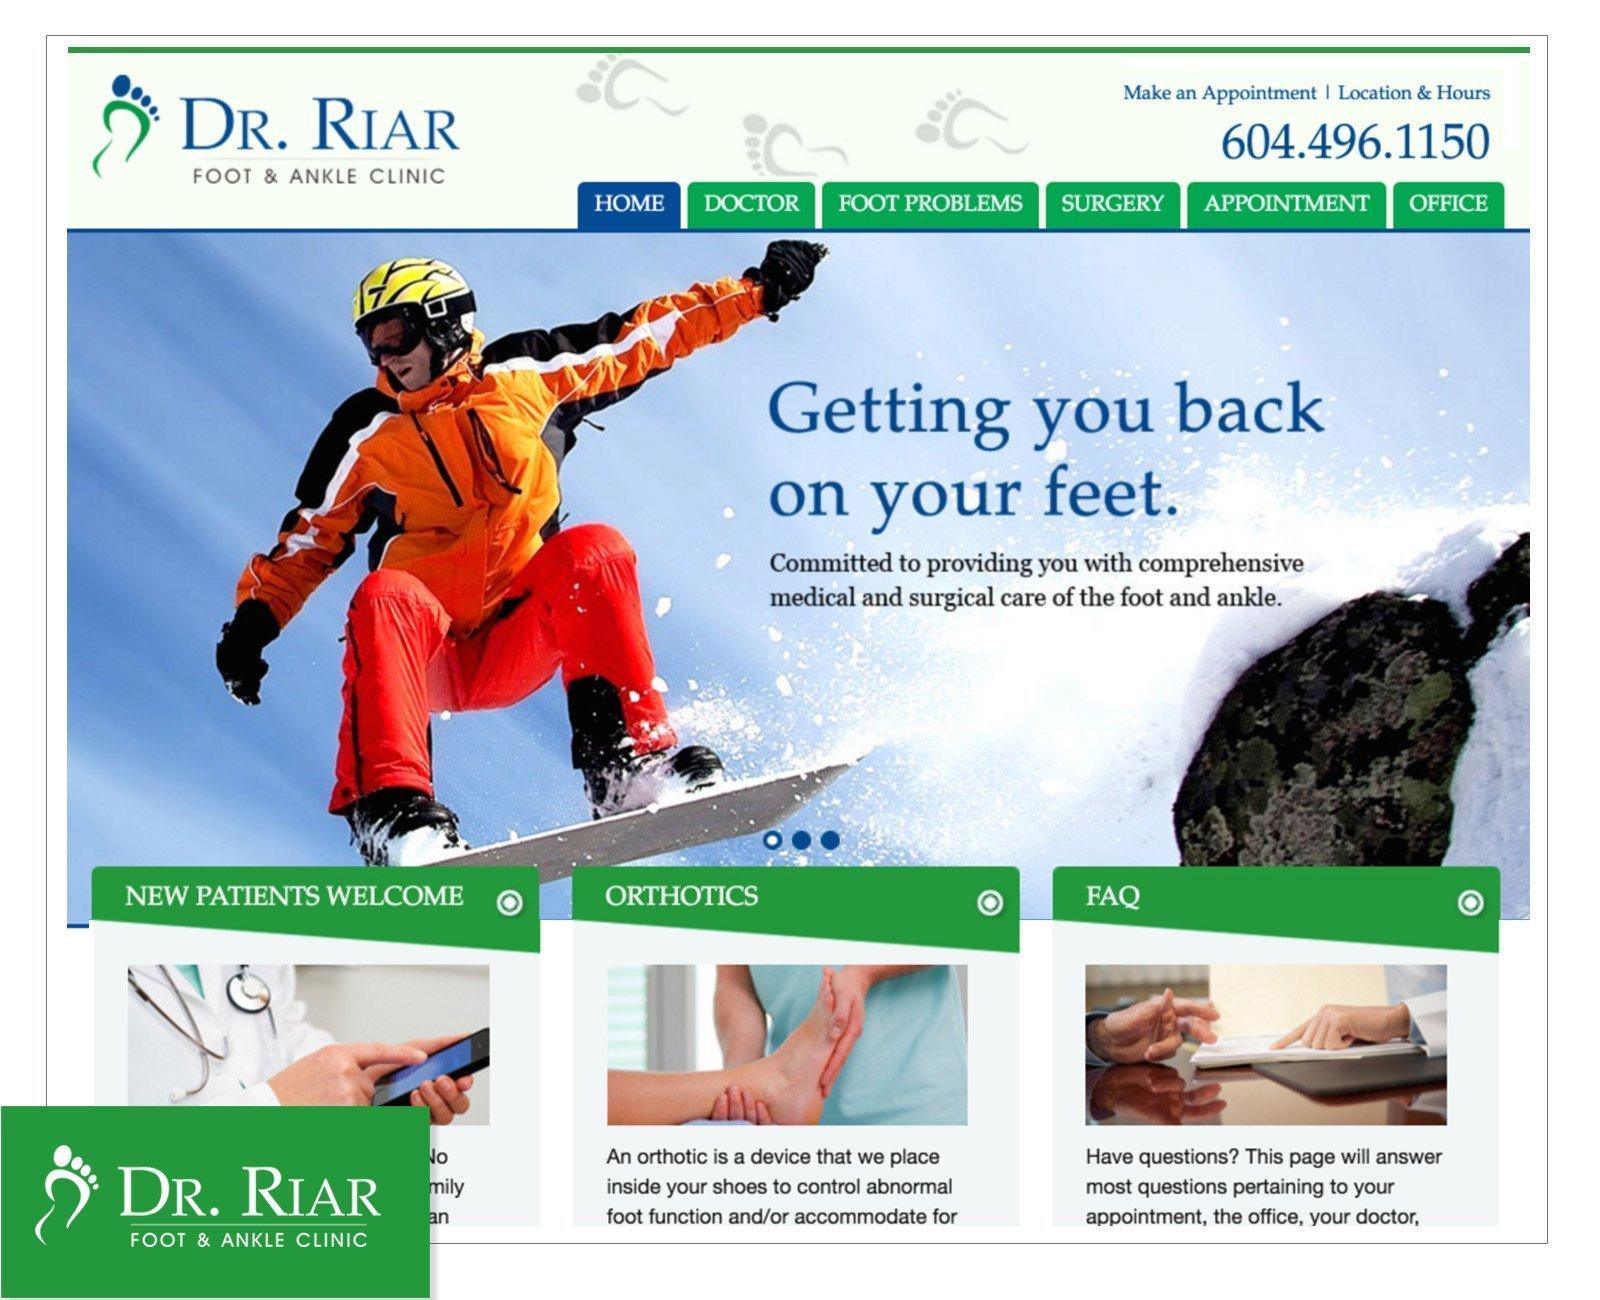 web-design-vancouver